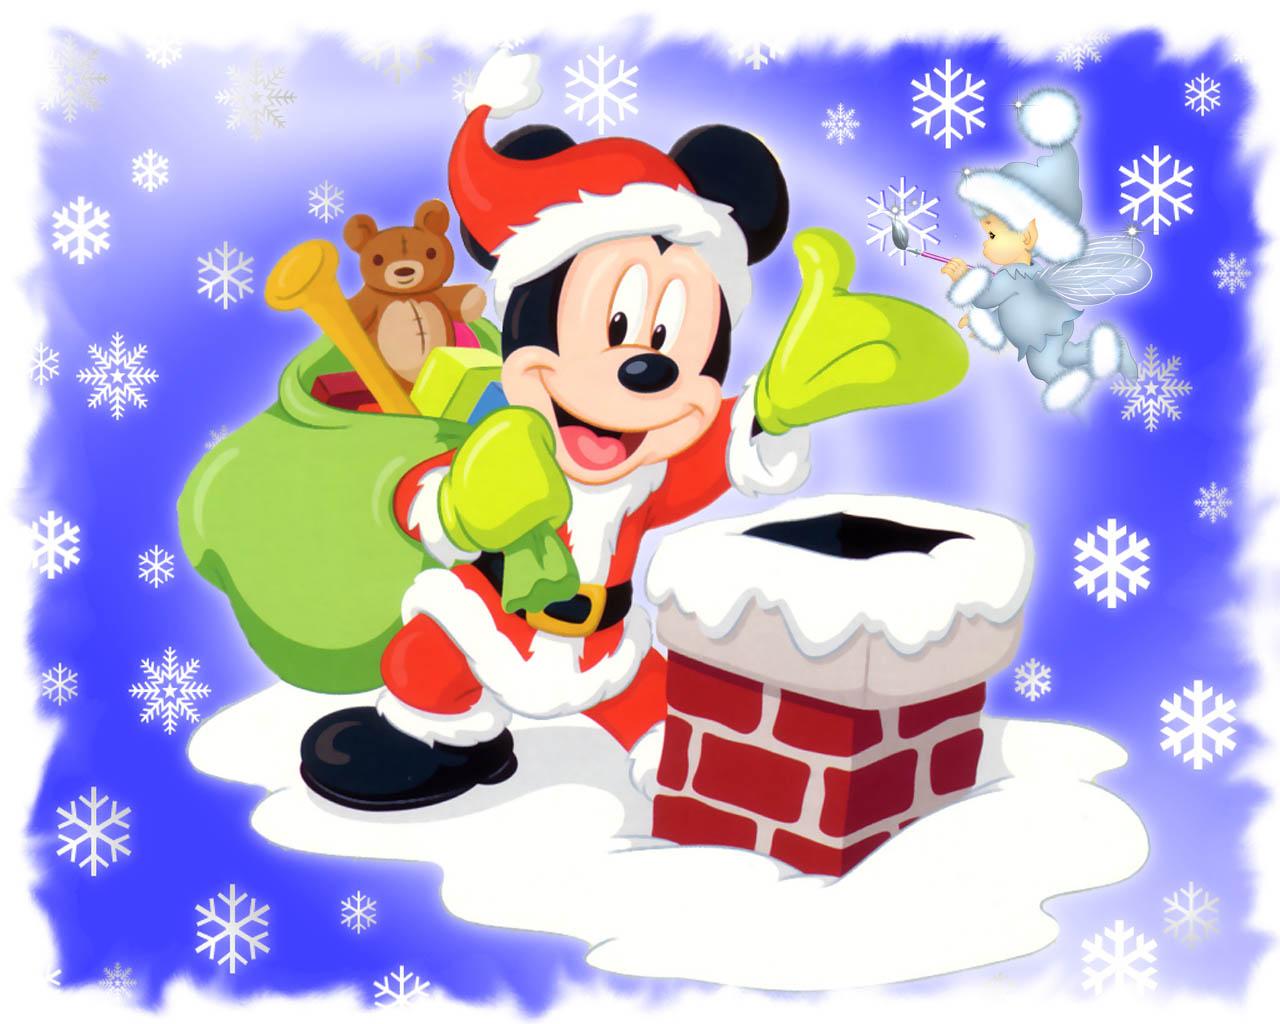 http://4.bp.blogspot.com/-oGuJiB3KBGU/TvG97eJjSGI/AAAAAAAABjo/MoTseA1vCUI/s1600/mickey_mouse_santa-normal5.4.jpg